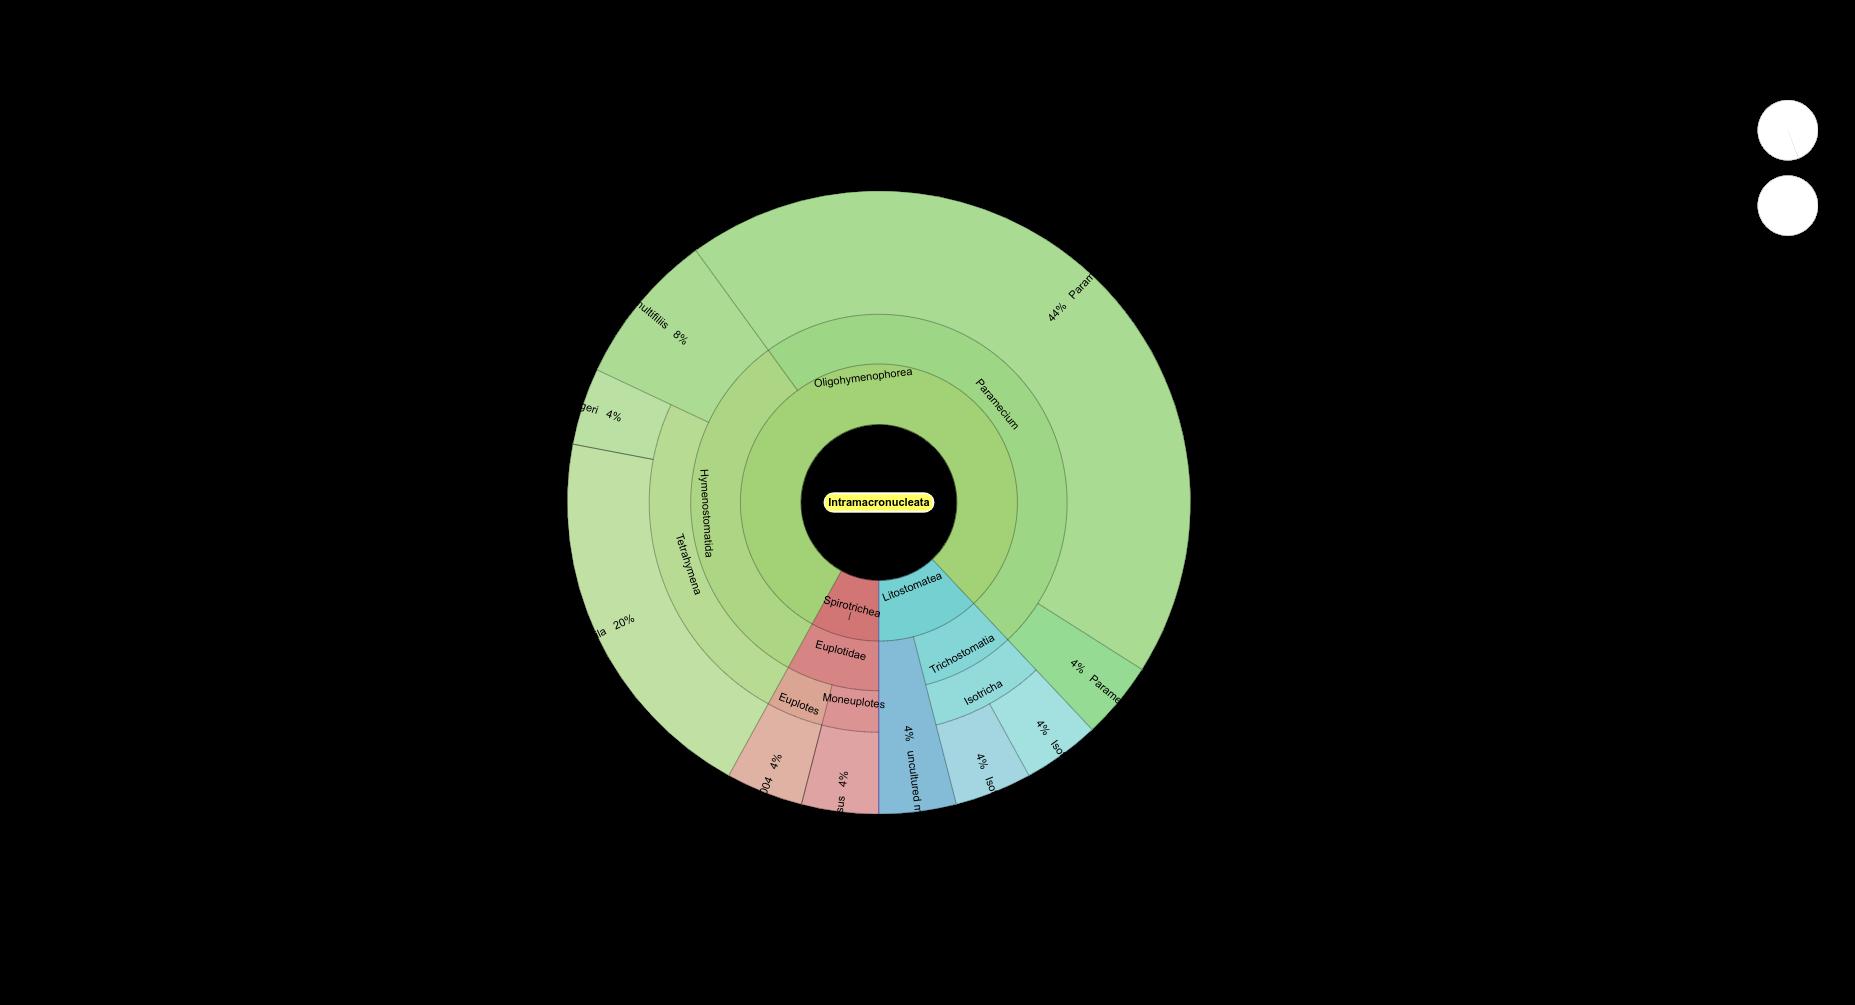 pH=8.2 Intramacronucleata krona plot